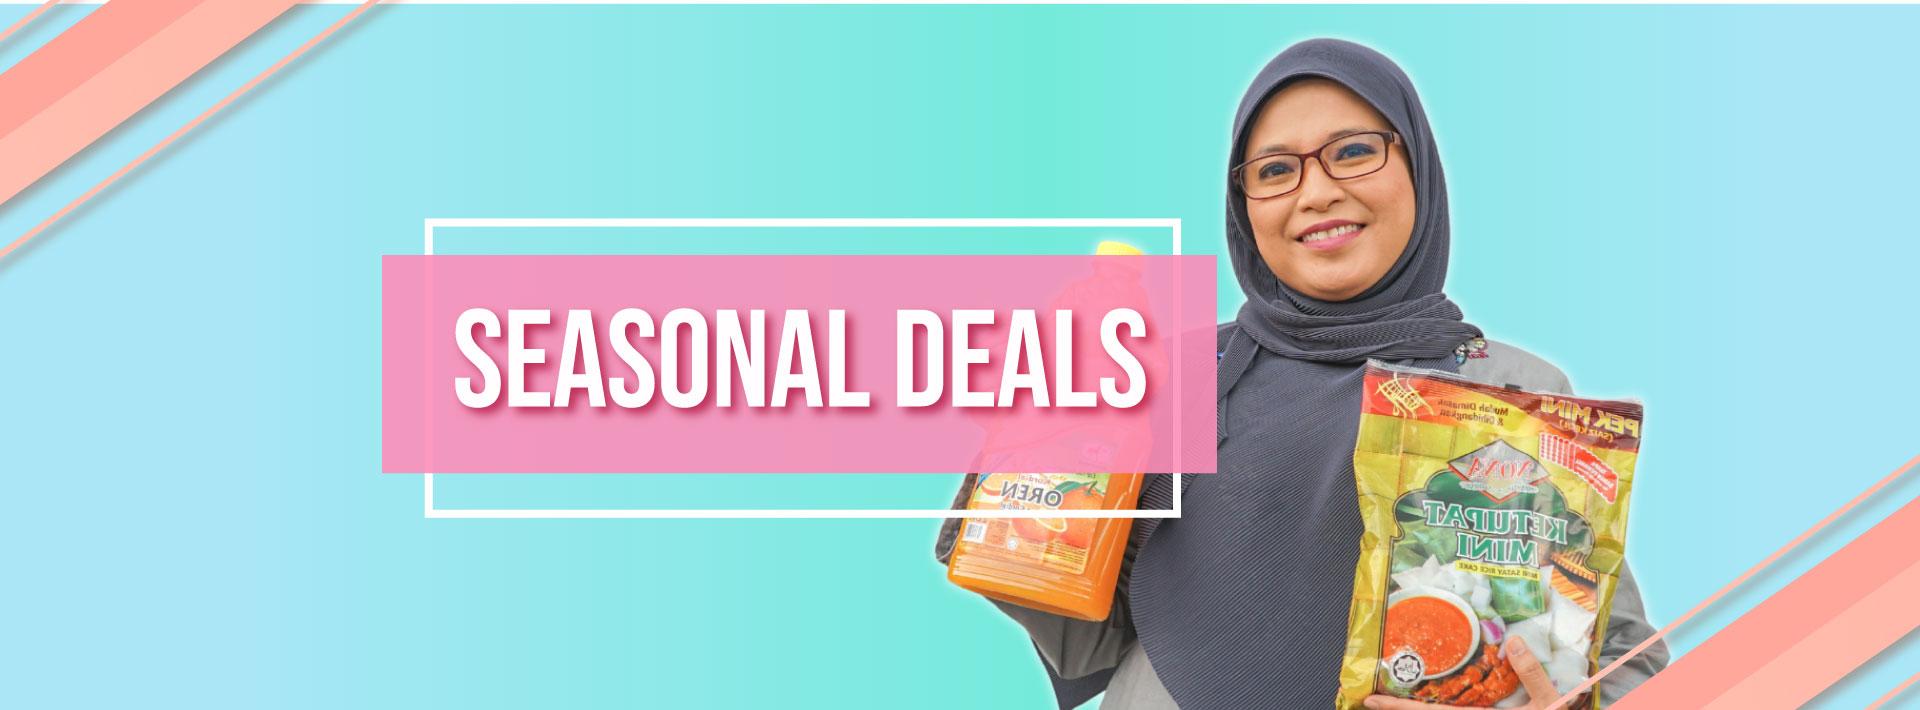 Seasonal Deals